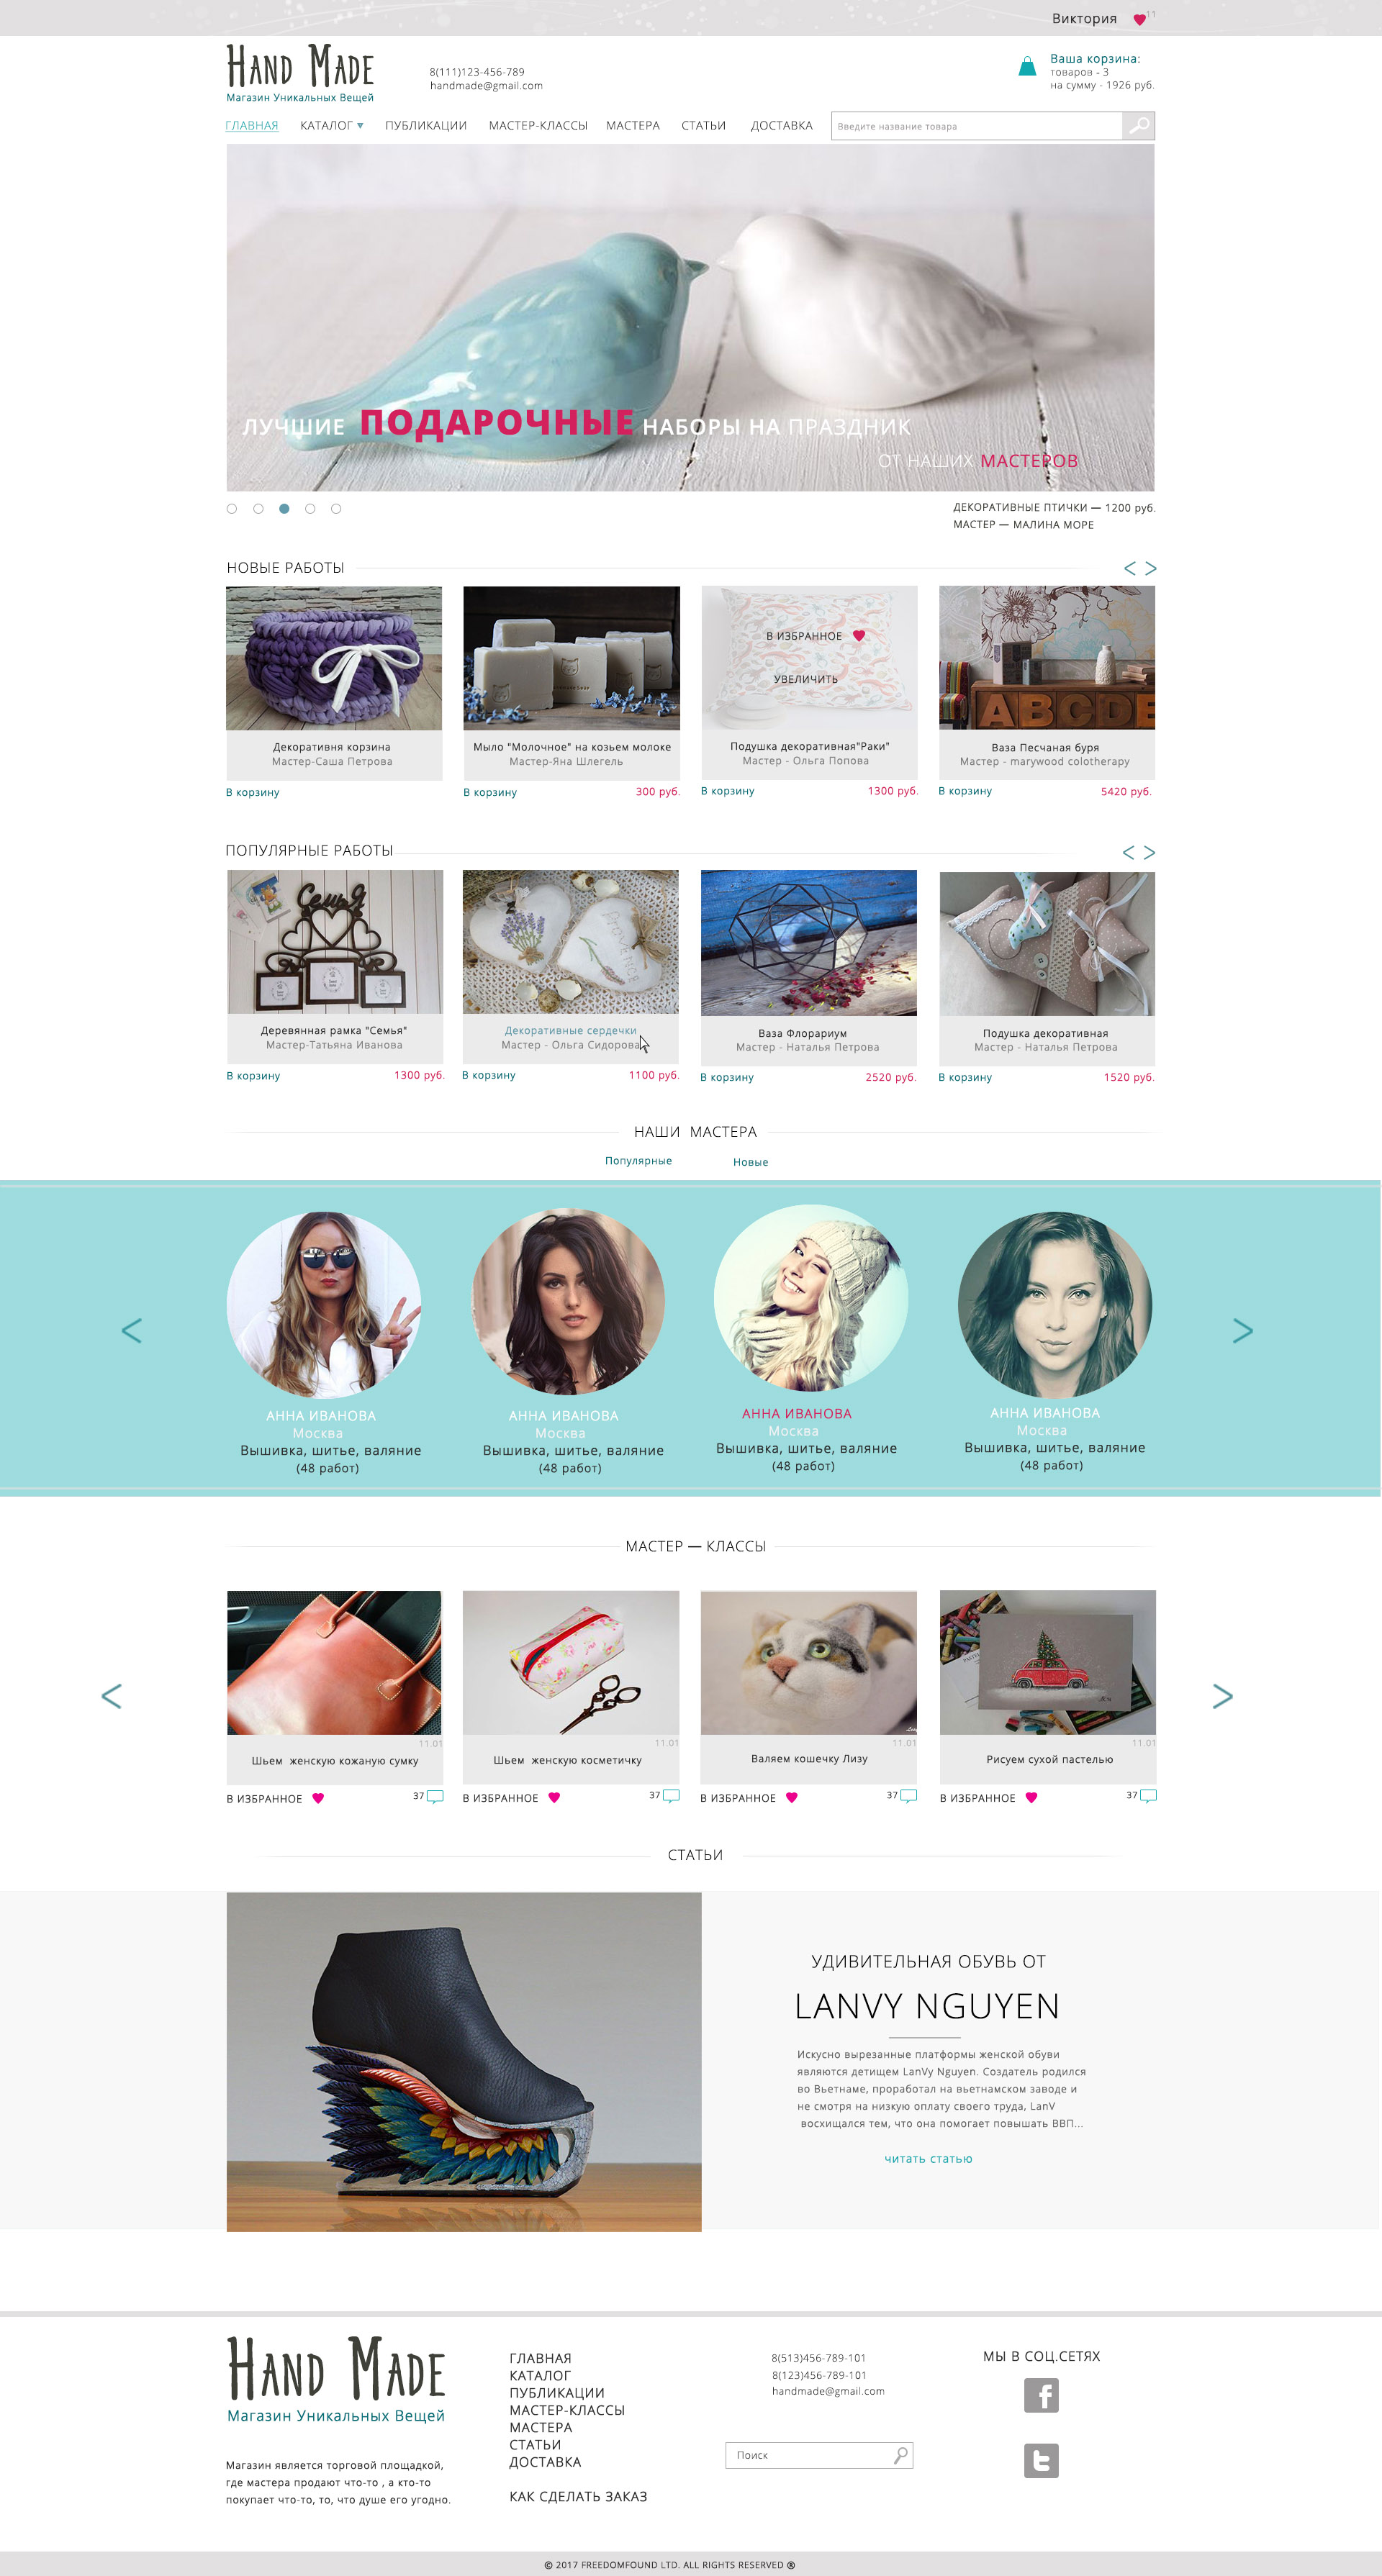 Разработка дизайна портала по тематике handmade. фото f_332587a6414ca346.jpg